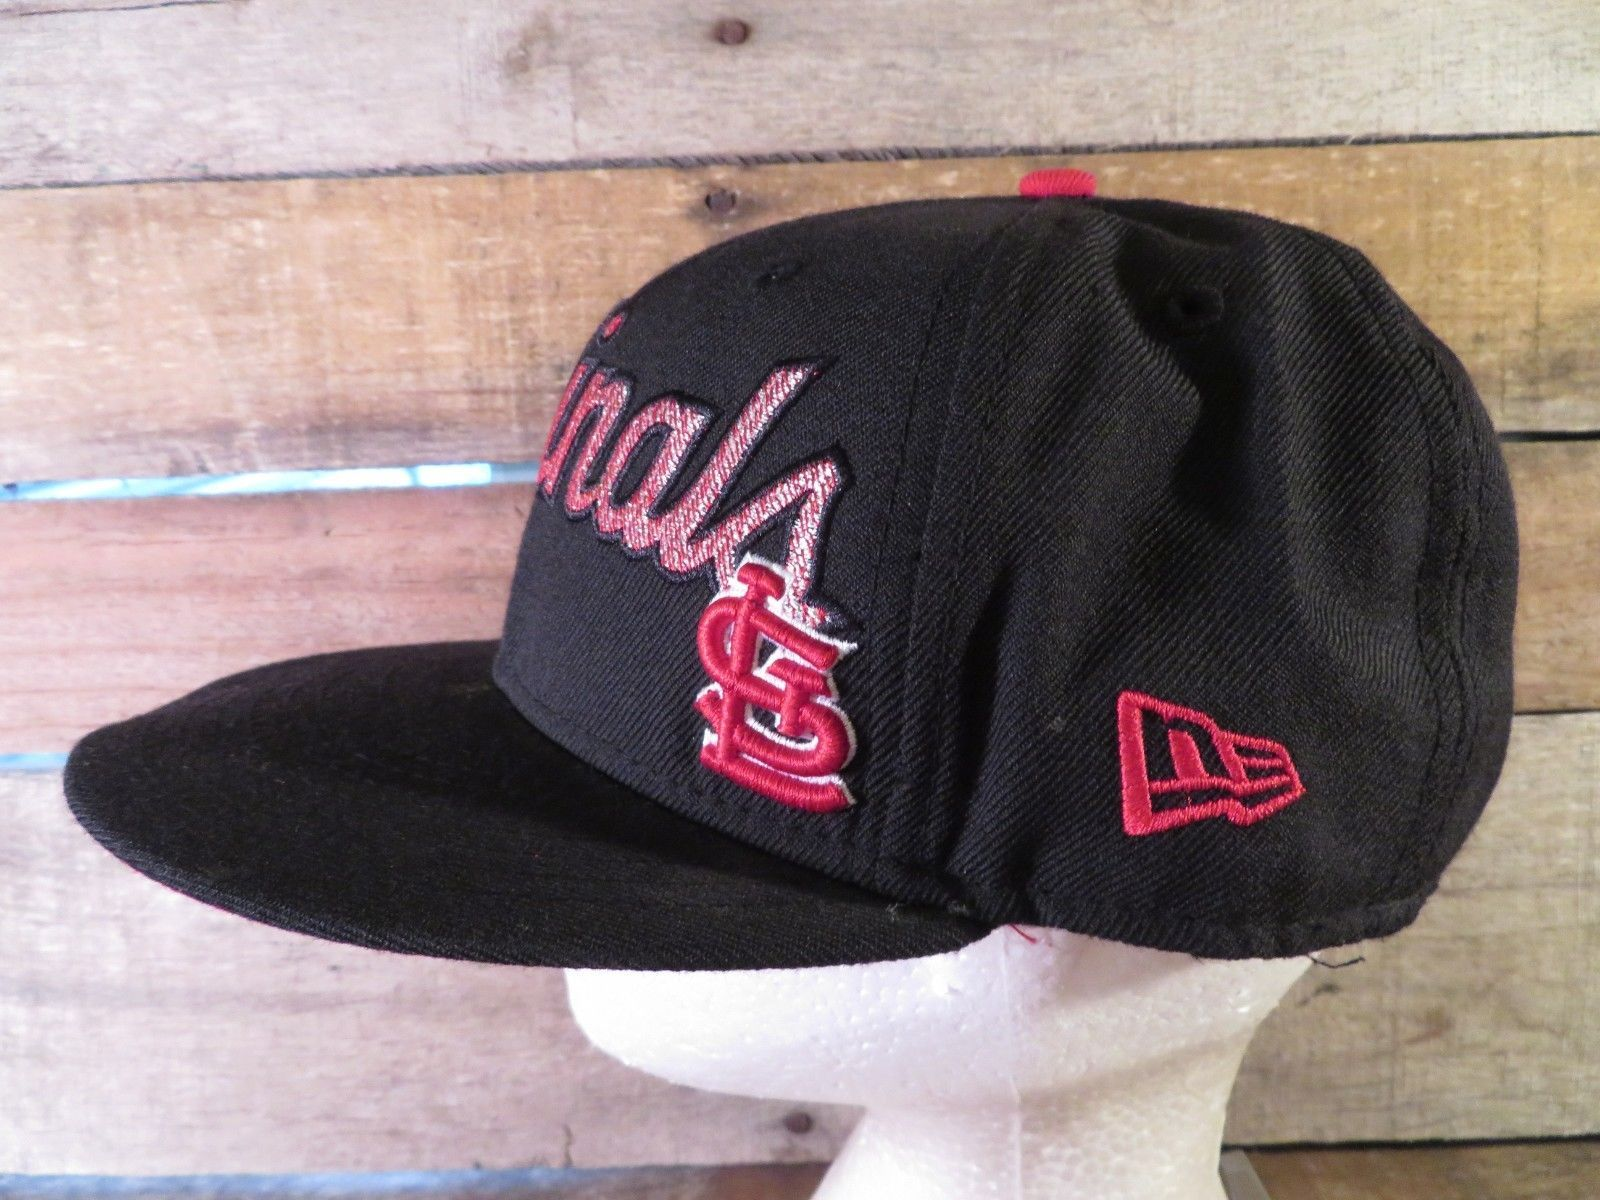 St Louis Cardinals Baseball New Era Aderente Misura 7 1/8 Adulto Cappello